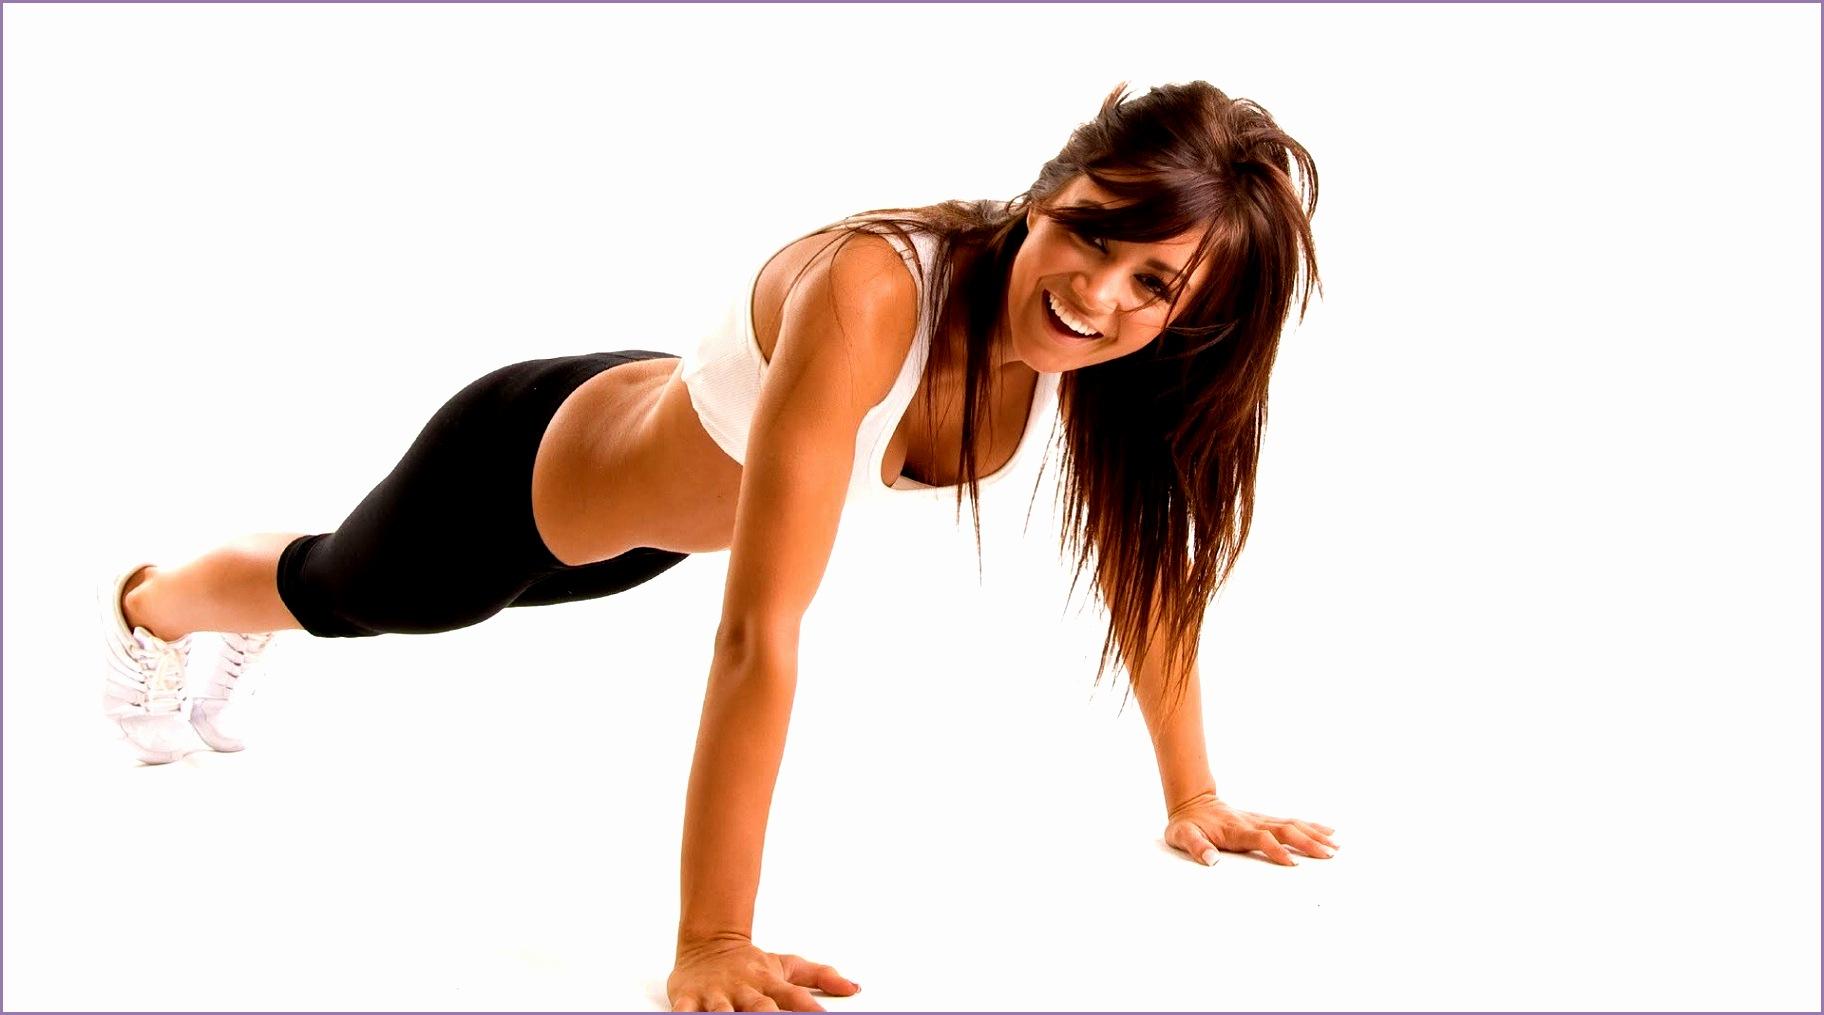 woman workout fitness hd wallpaper